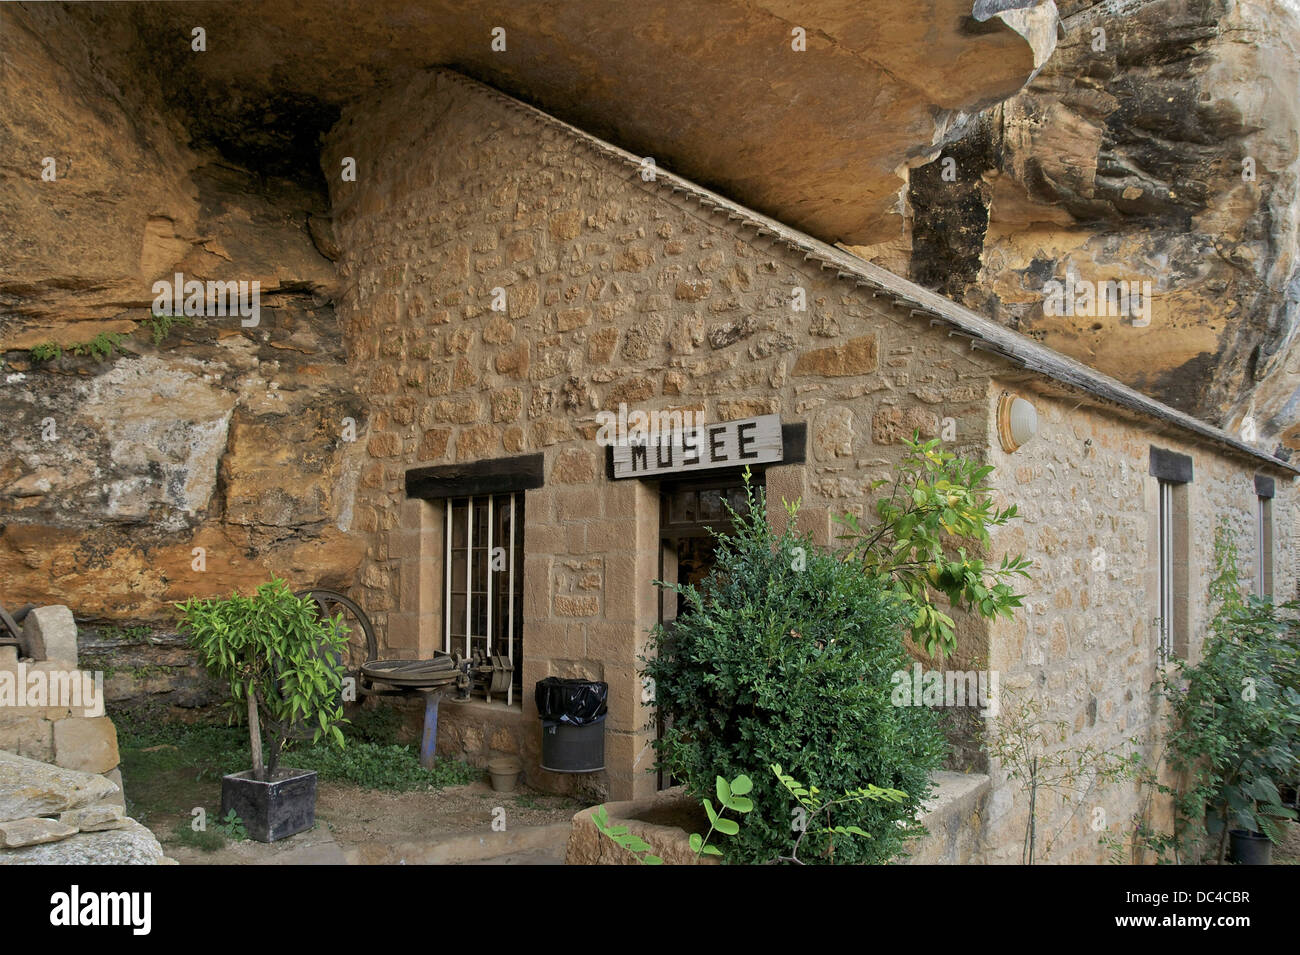 troglodyte prehistoric museum of the 'Sorcerer Cave', Roc de Saint-Cirq, Dordogne, France. - Stock Image